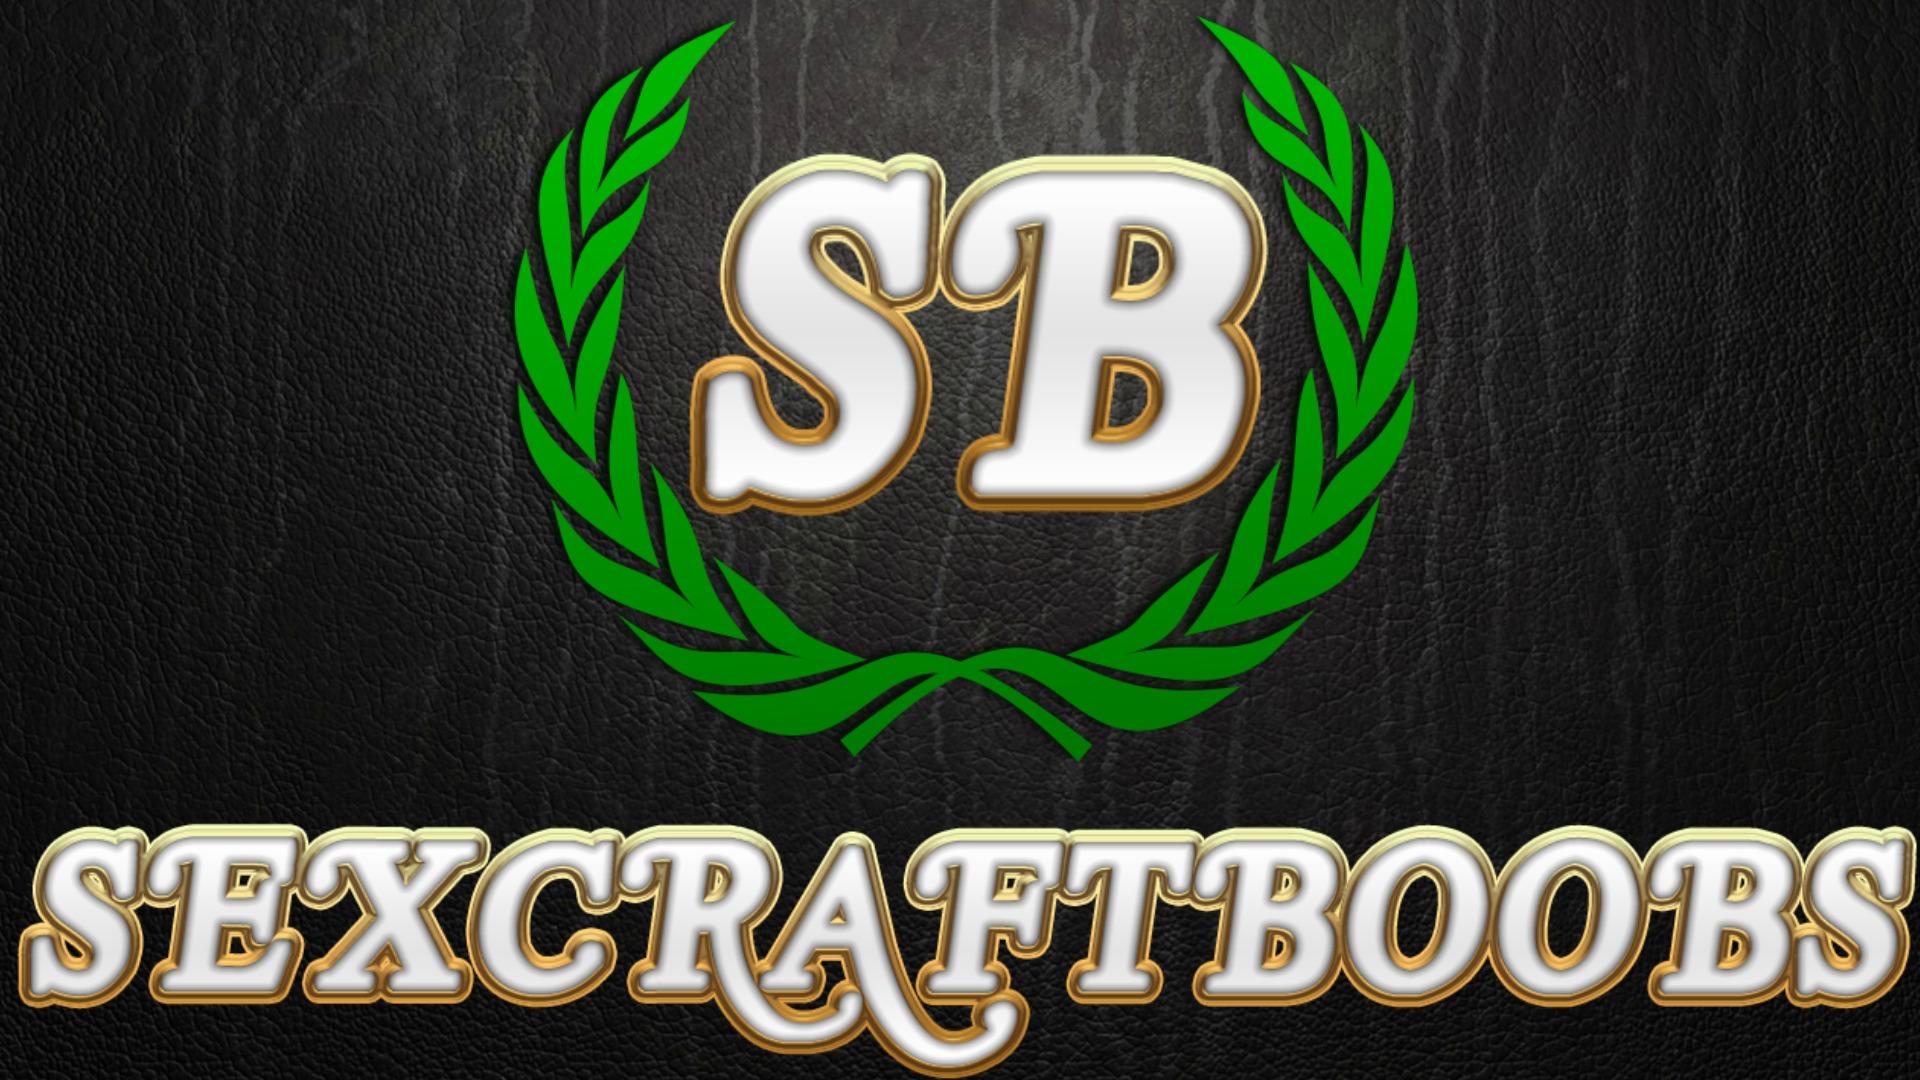 Sexcraftboobs